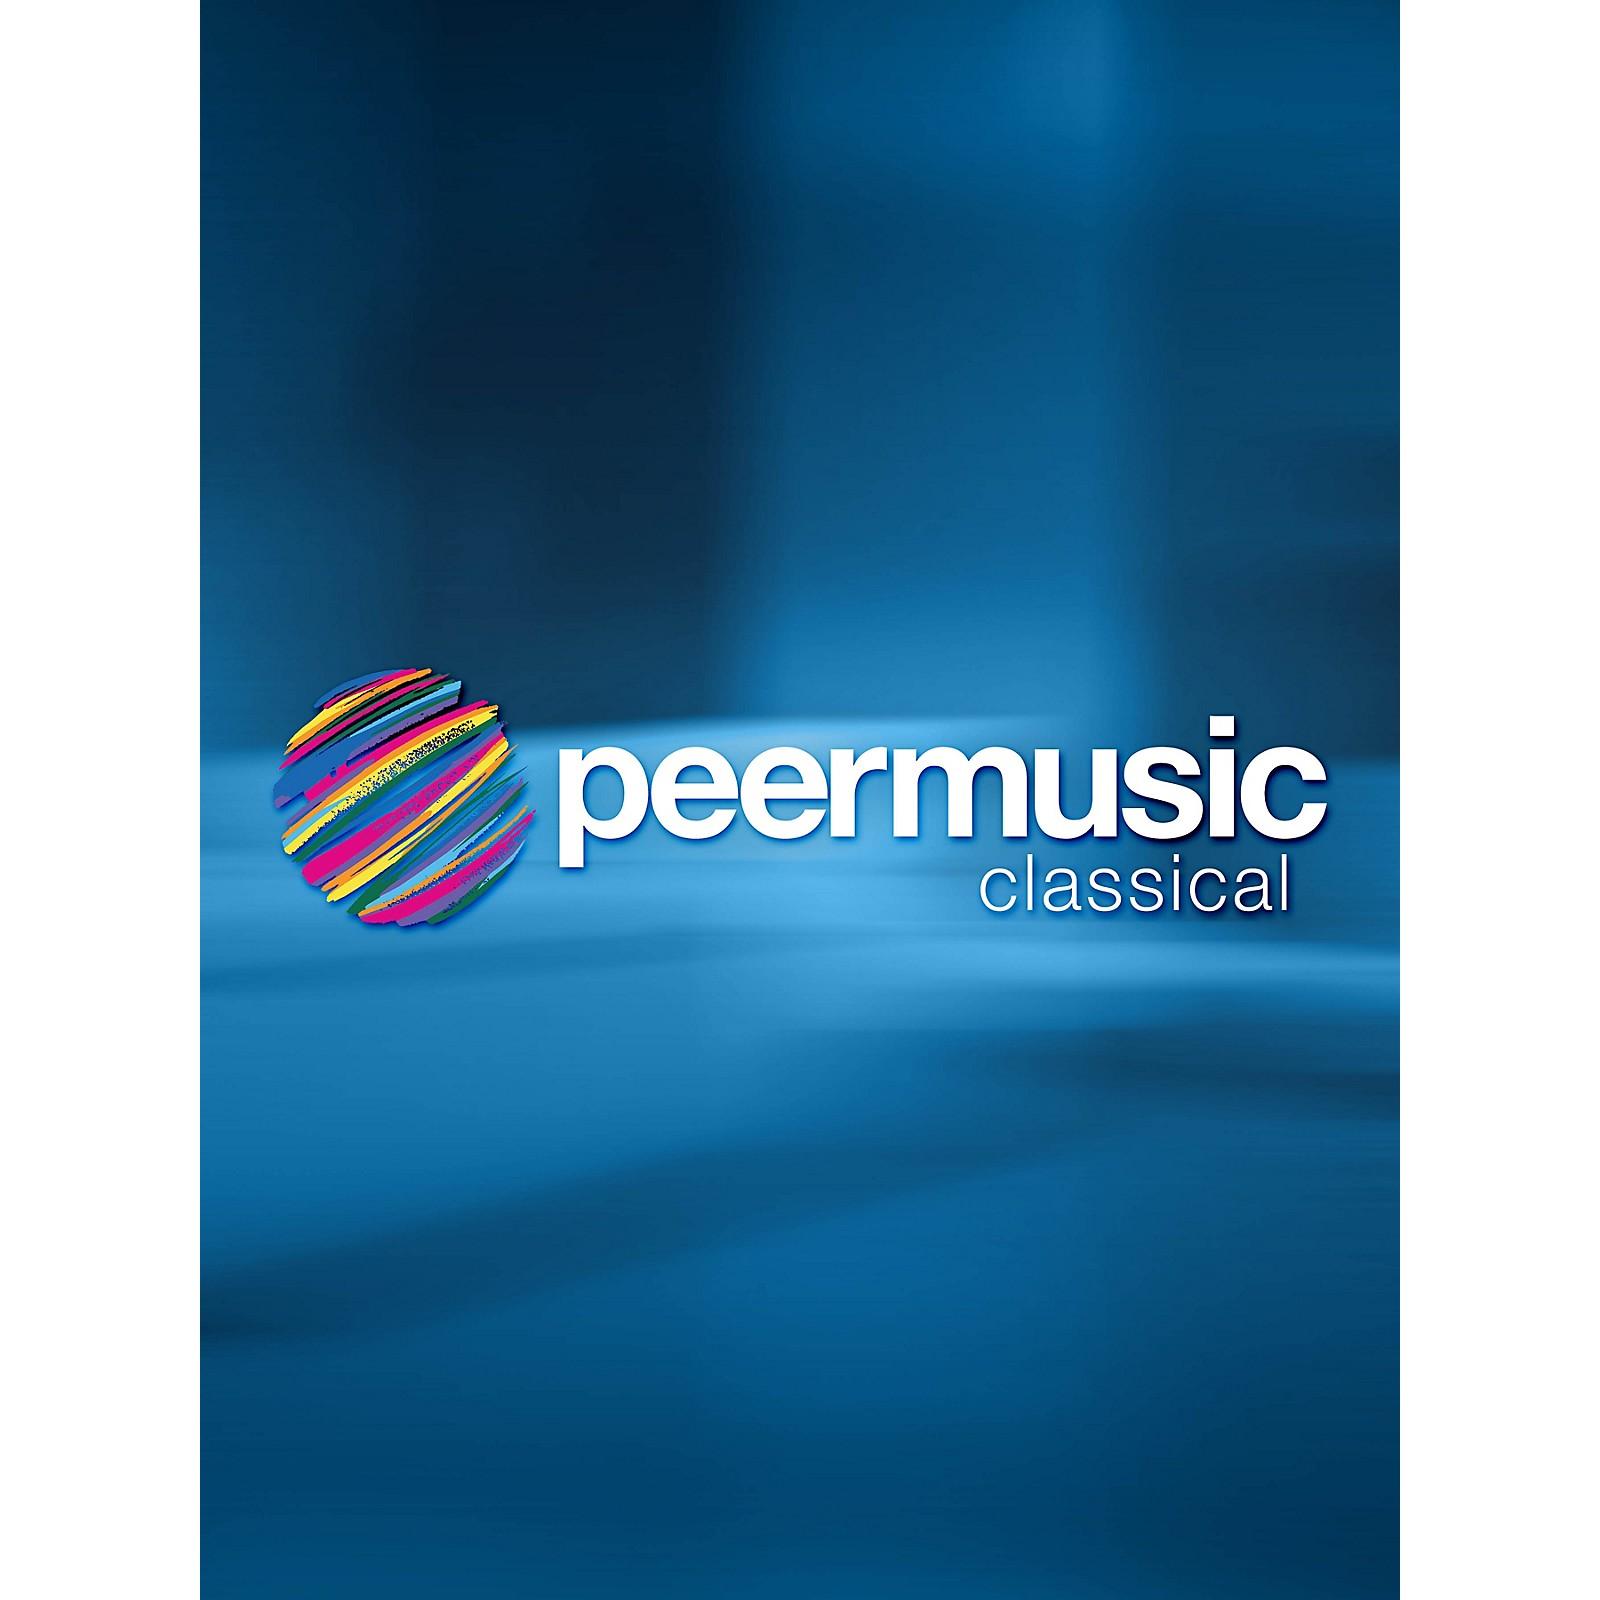 Peer Music 2 Canons (3 Tubas) Peermusic Classical Series Book  by Robert Schumann